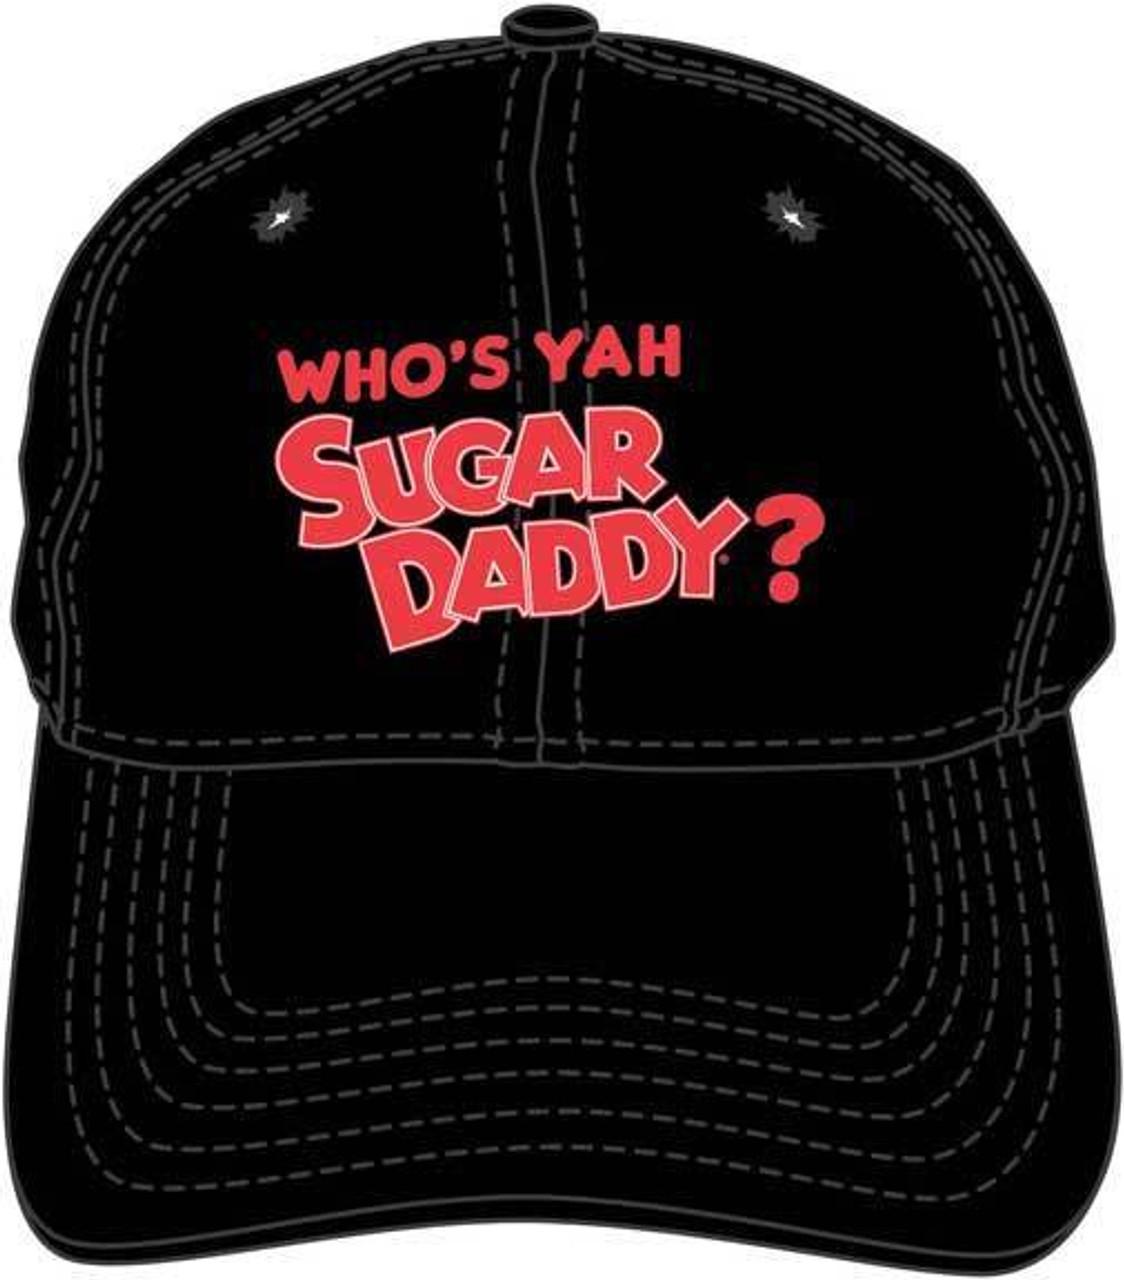 4abeec59dc60d0 Who's Yah Sugar Daddy Candy Black Embroidered Dad Hat Baseball Cap  BA01837TRIU